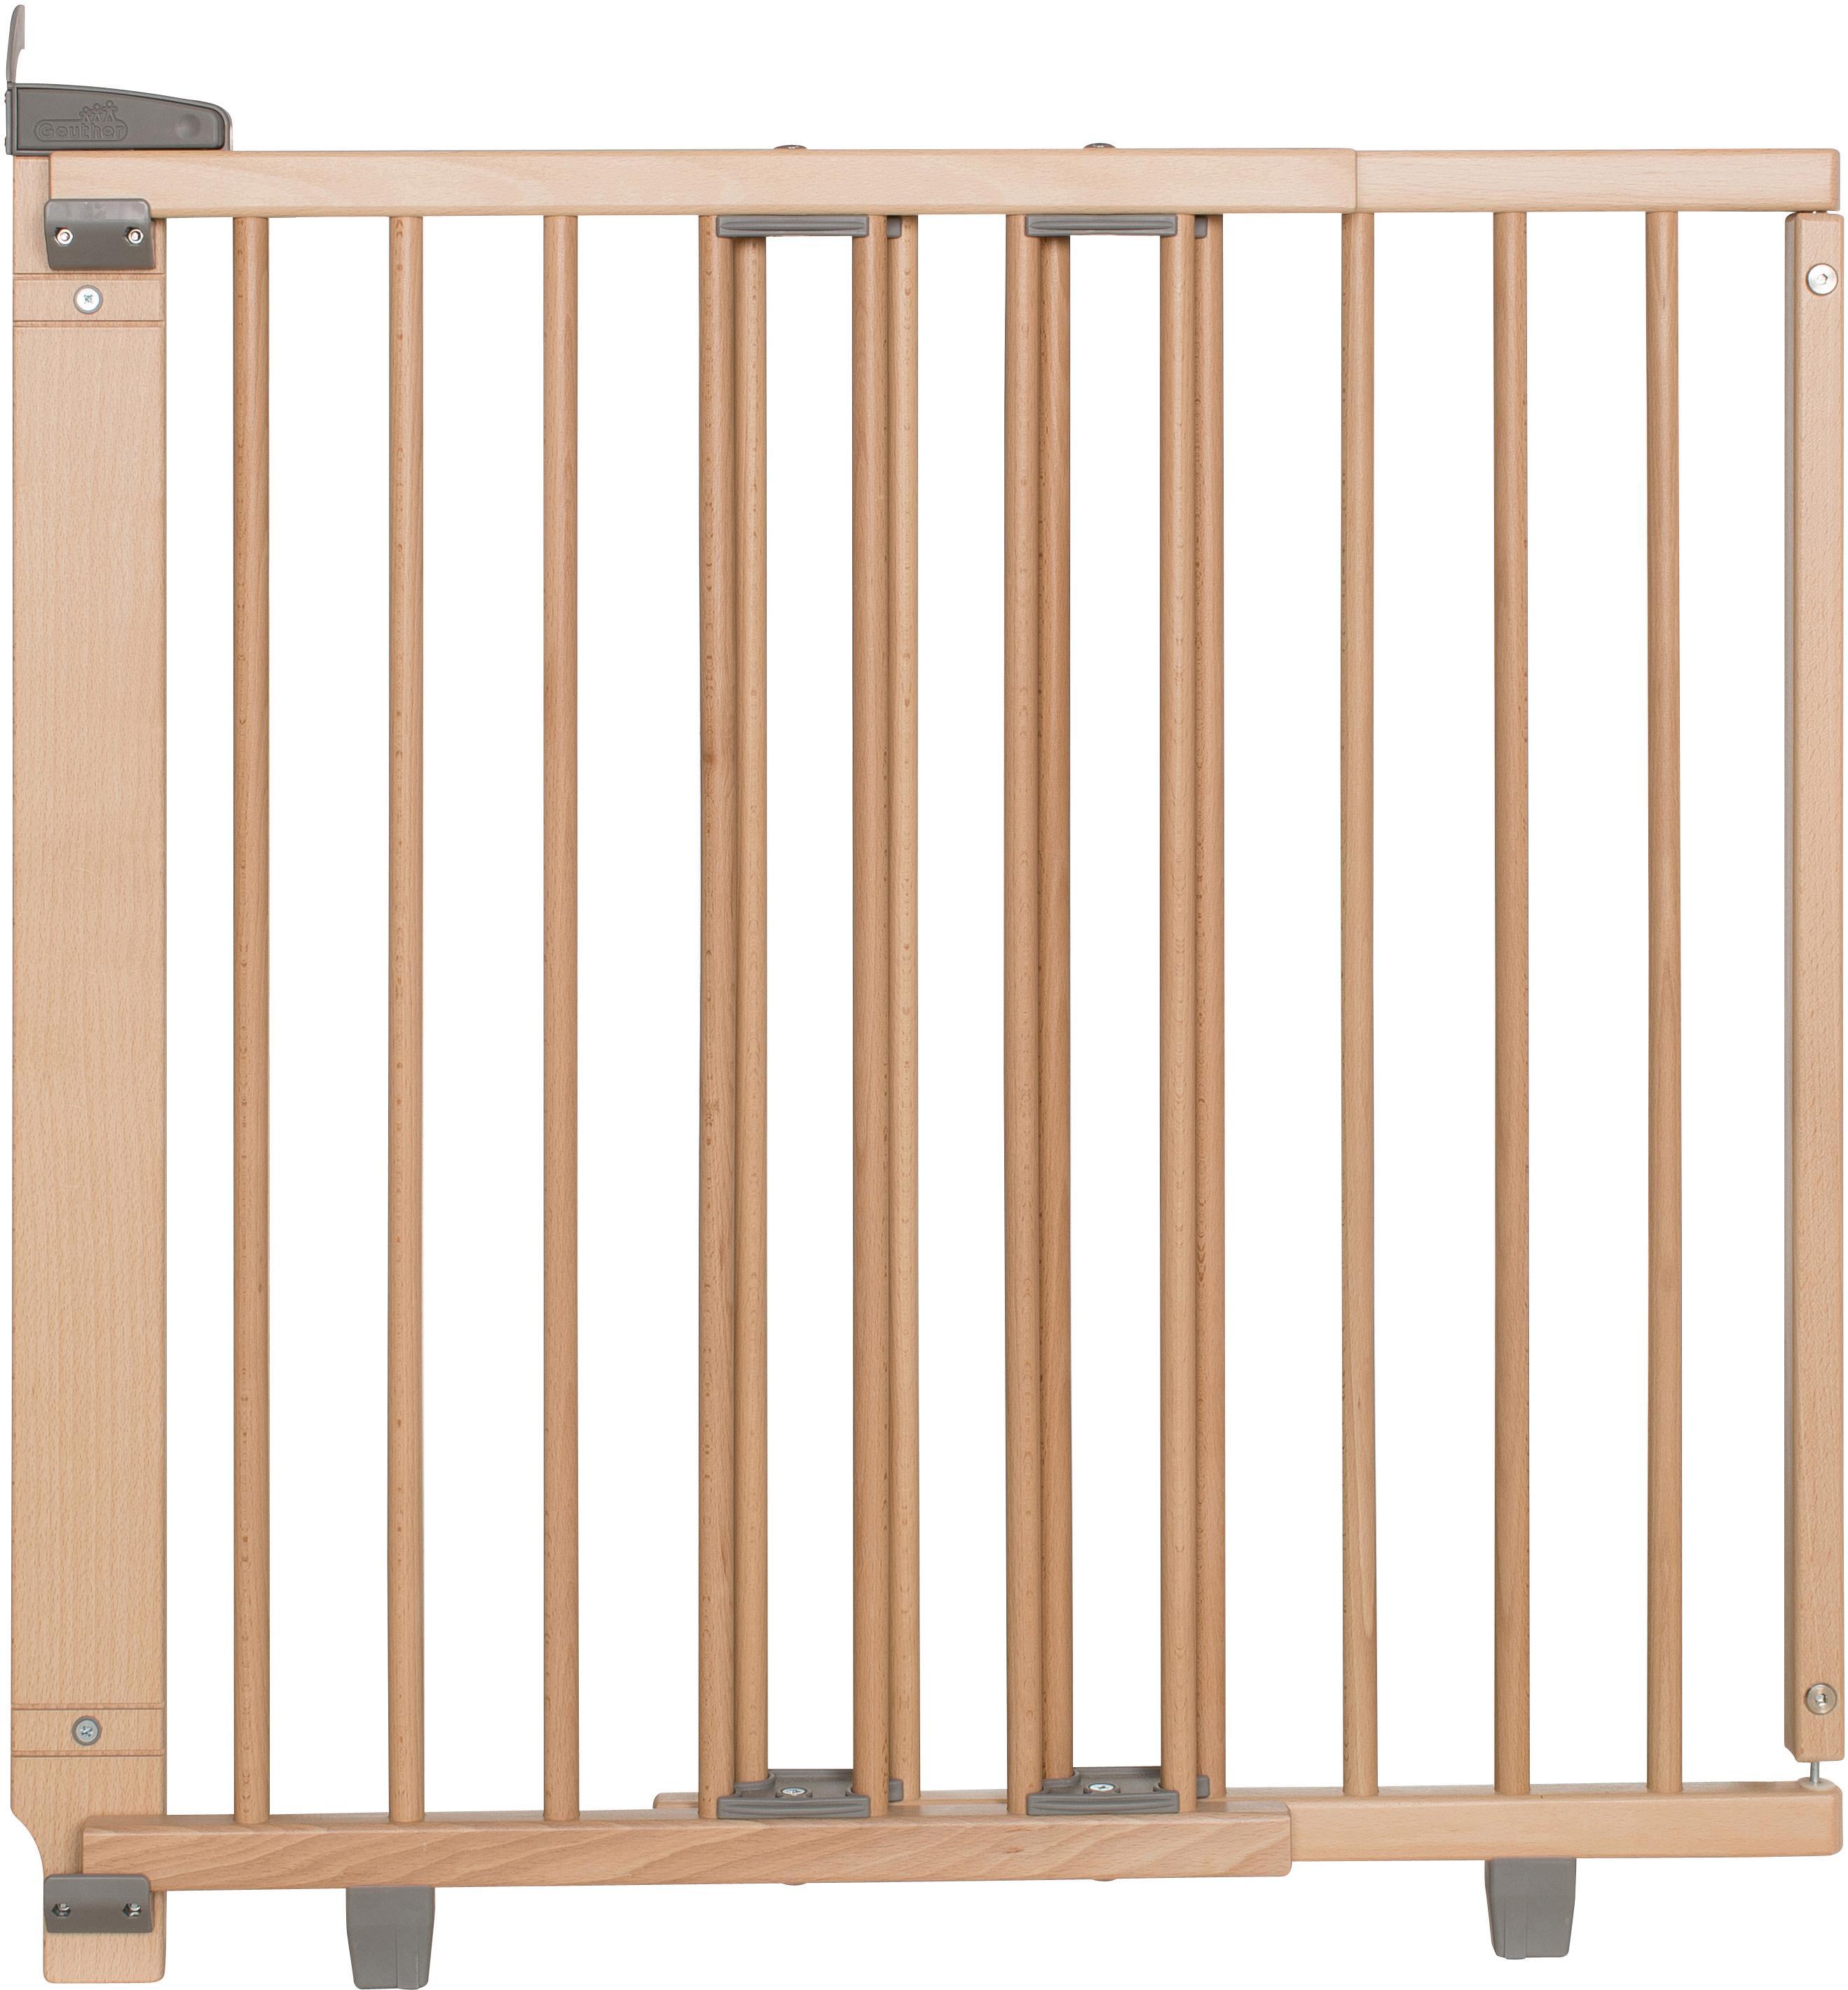 Geuther Treppenschutzgitter Plus natur 67-107 cm Kindermode/Ausstattung/Babygitter/Treppenschutzgitter